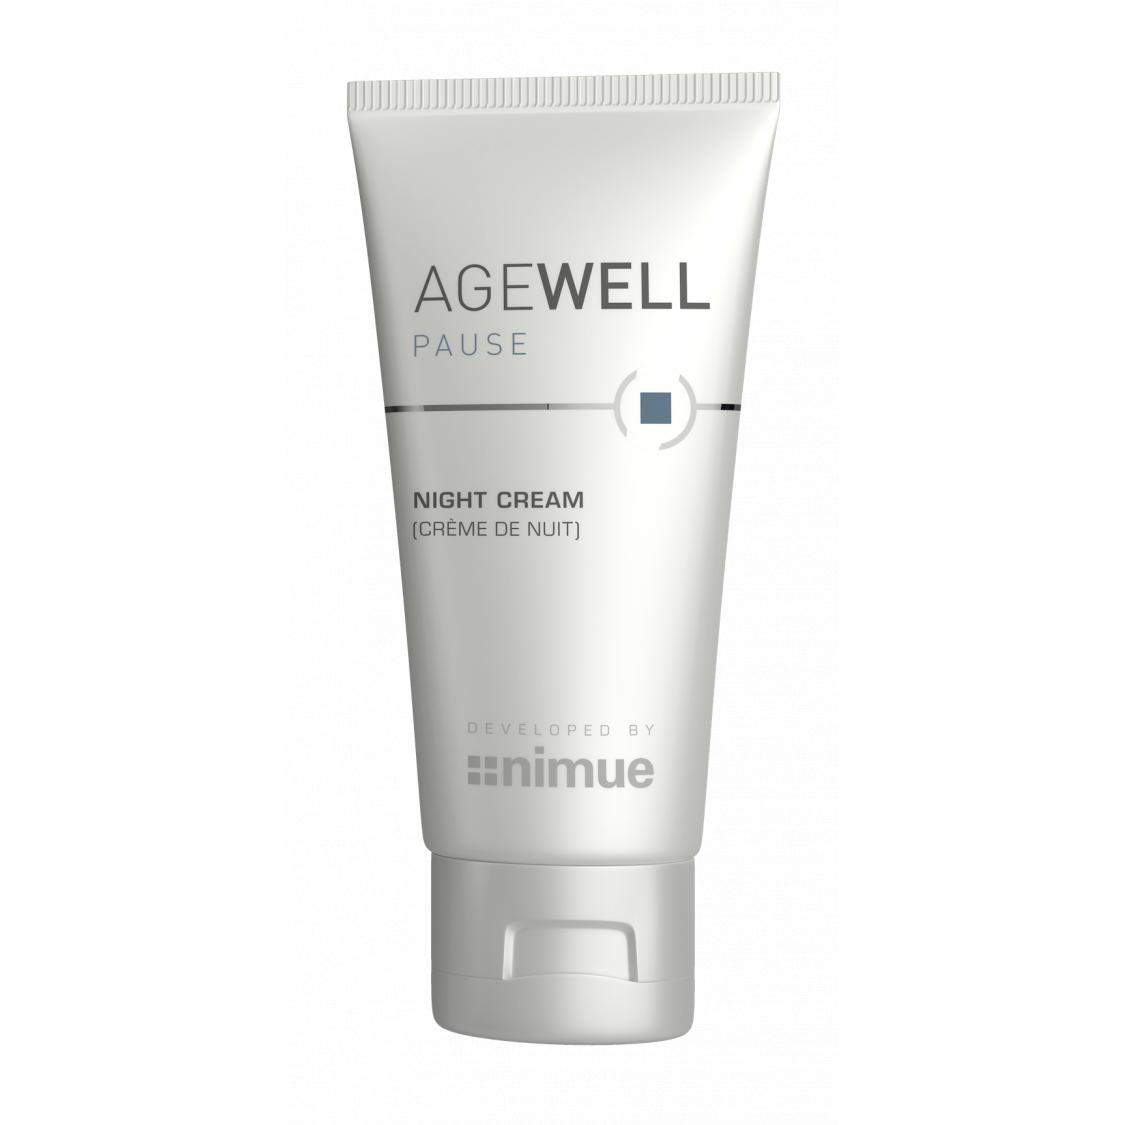 Agewell - Pause Night Cream 30's 50ml